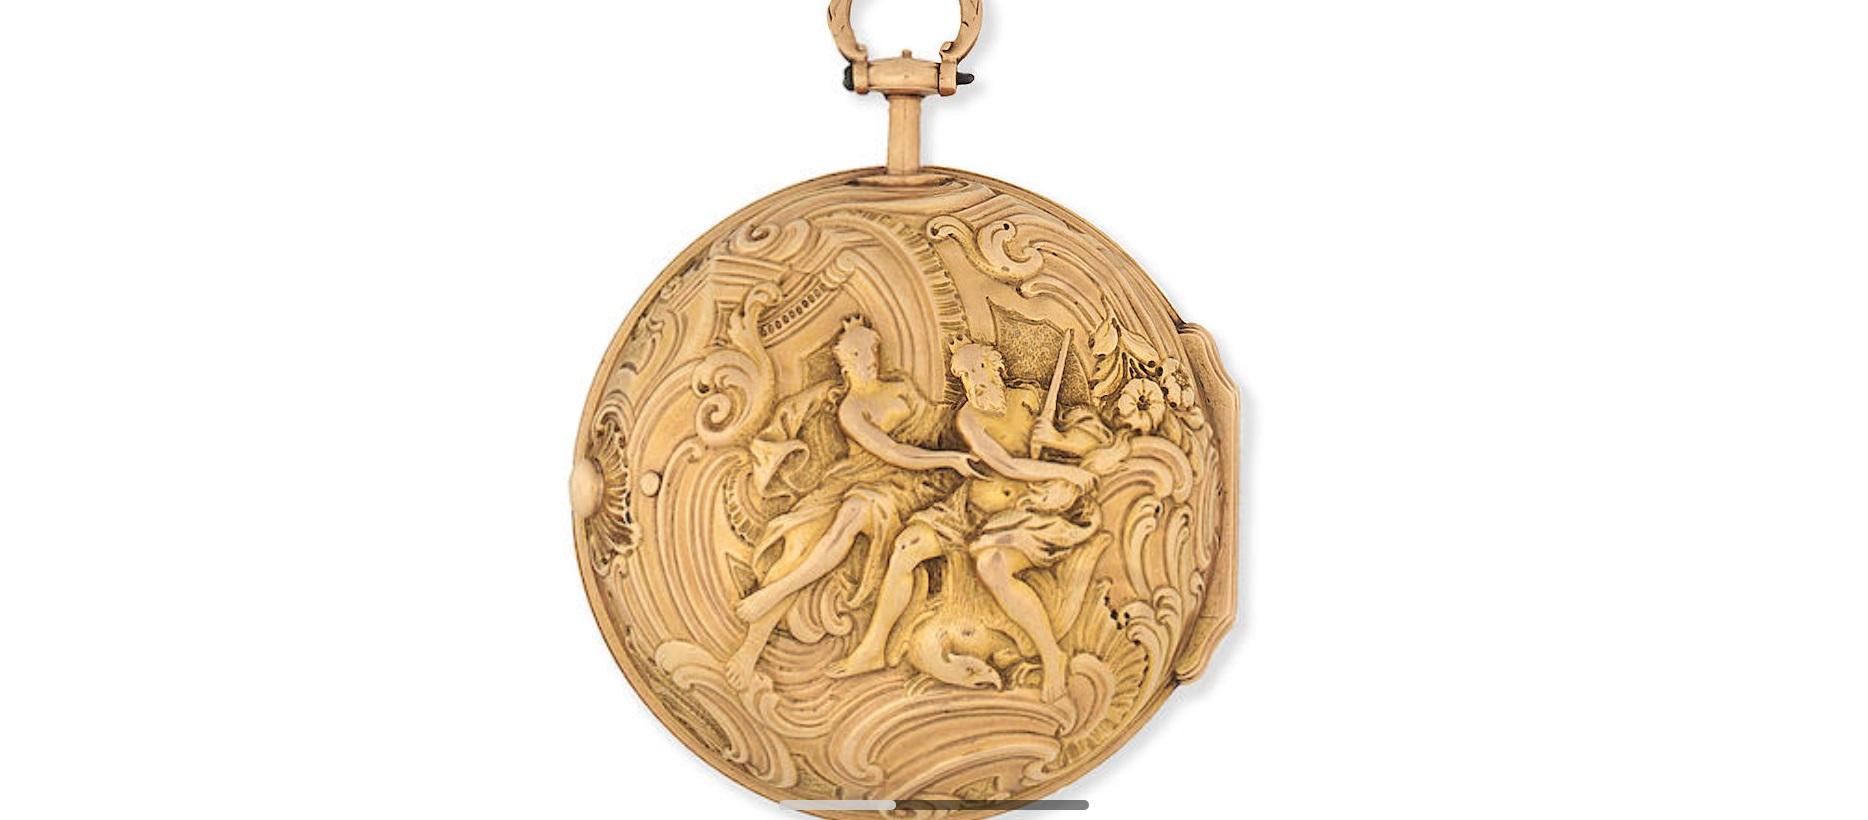 Lot 1 - A gold key wind pair case pocket watch with repoussé decoration